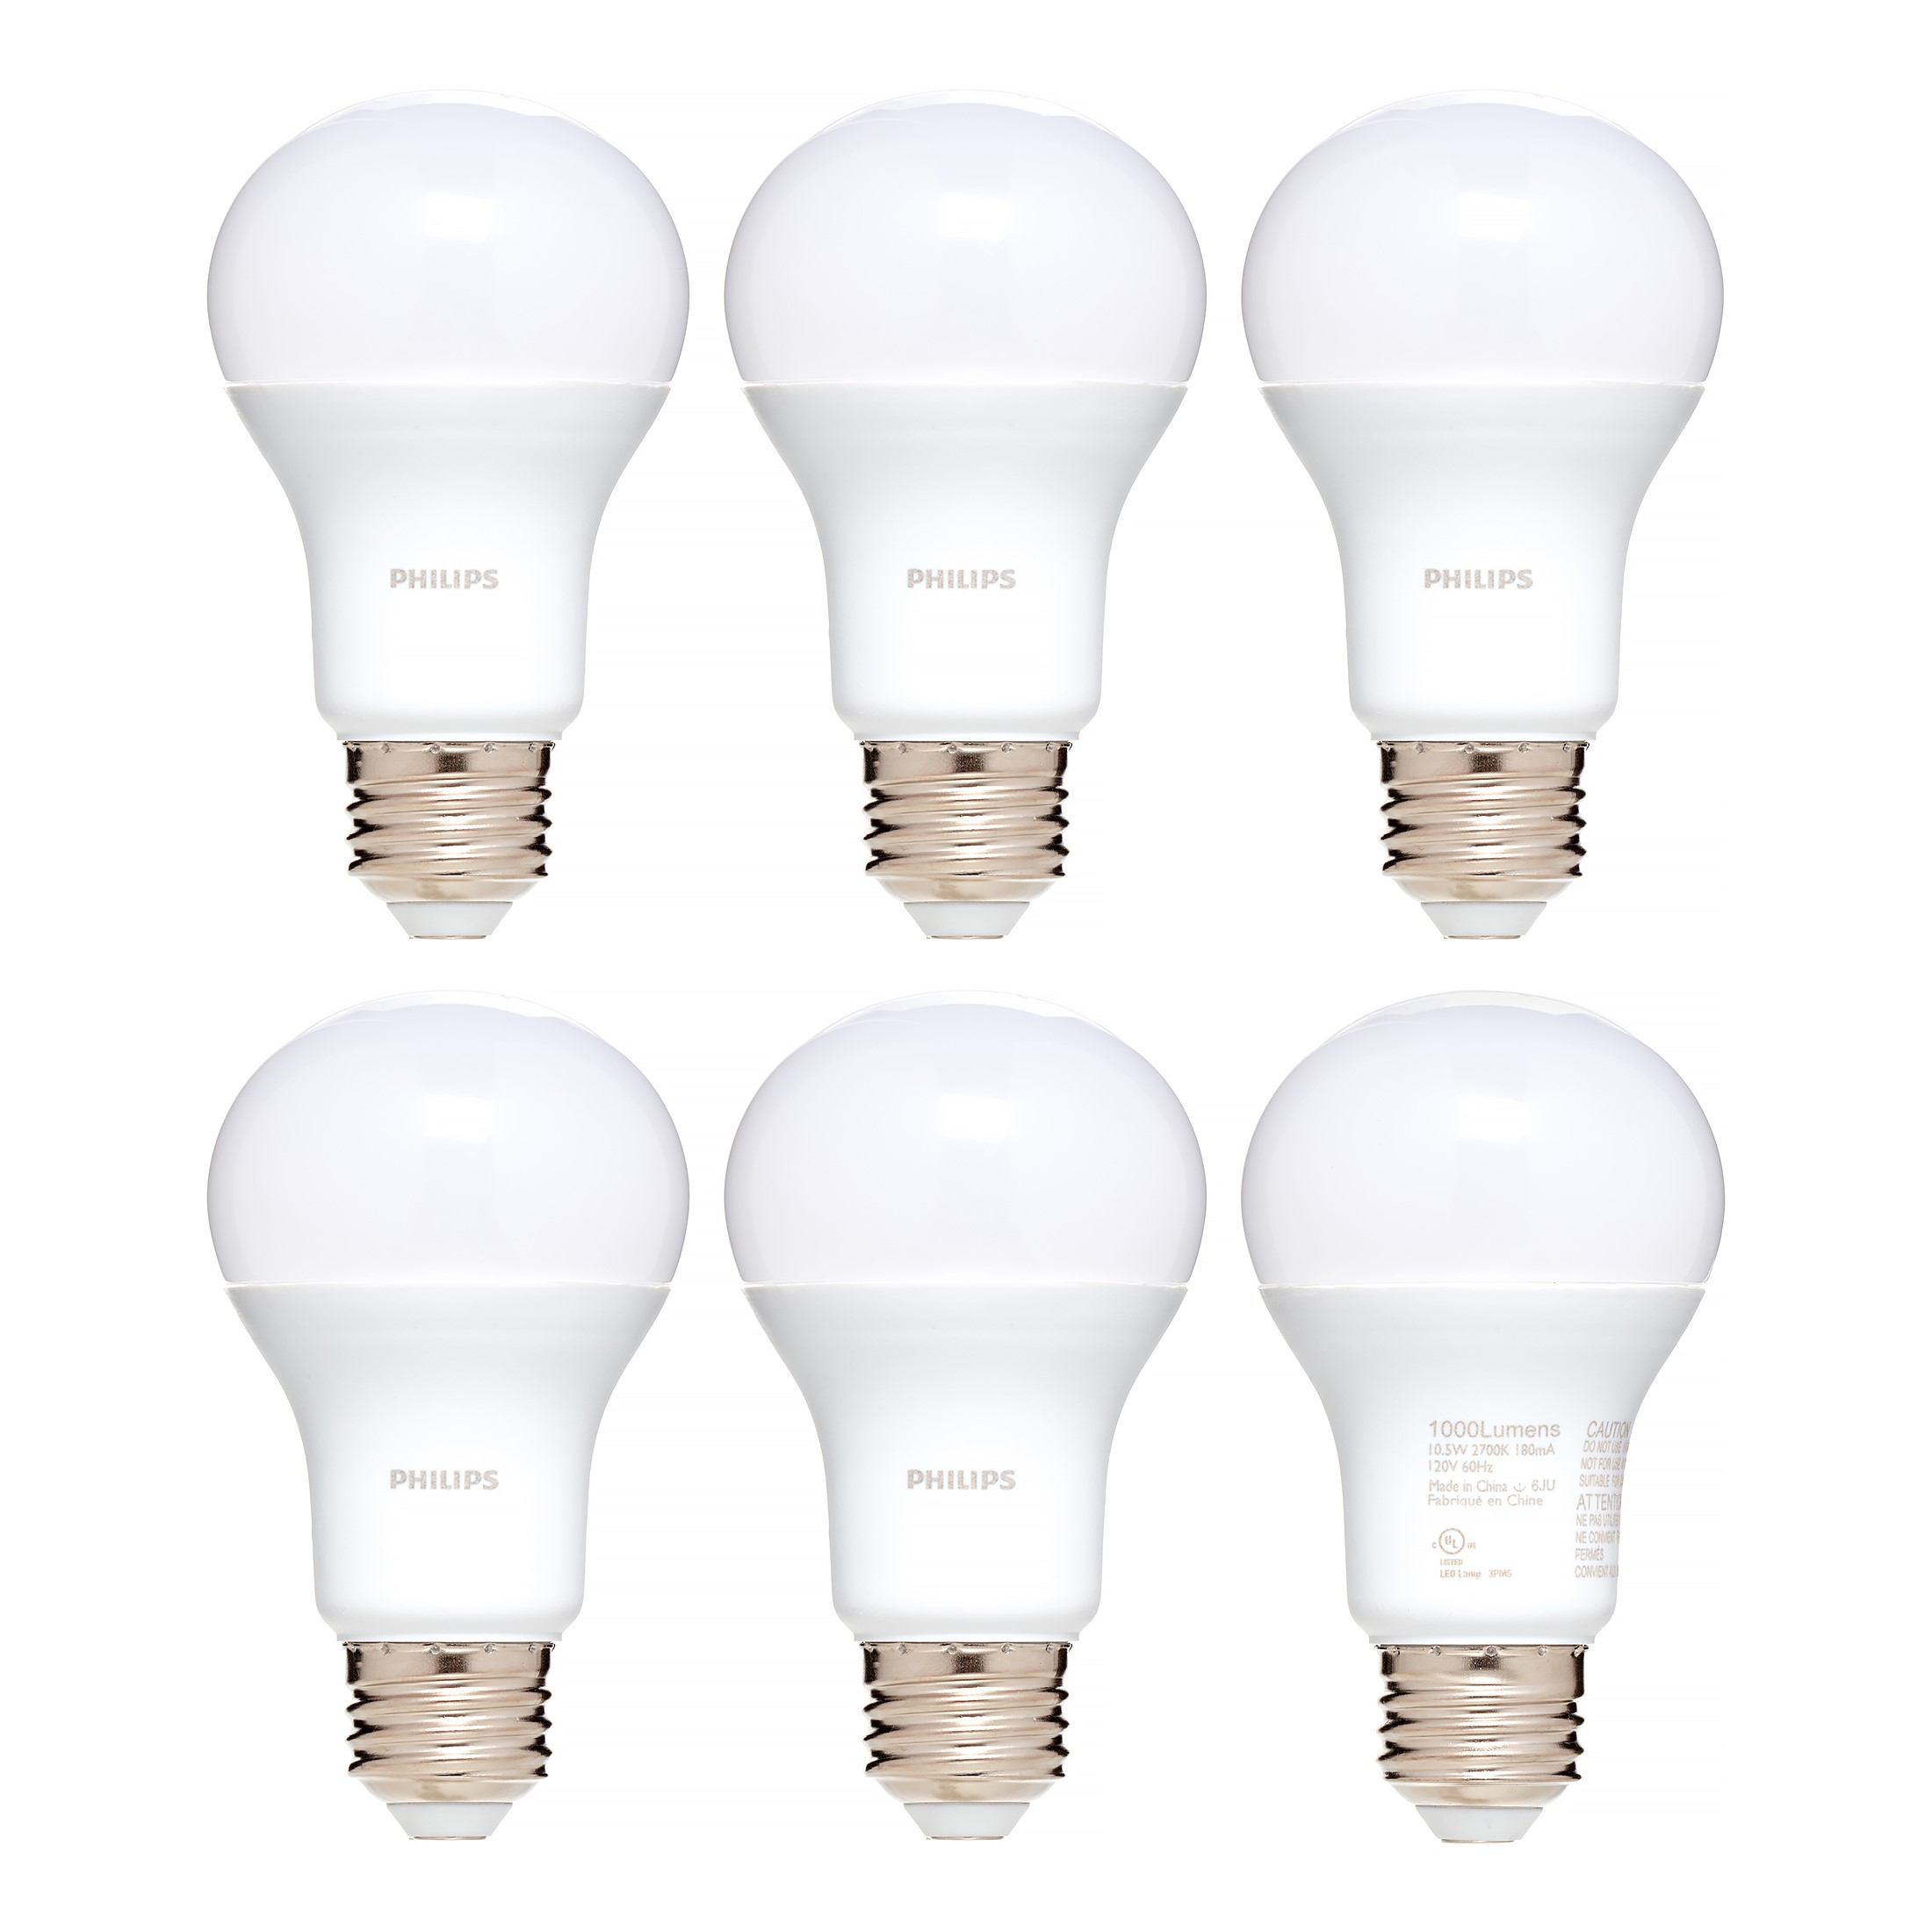 Philips LED Light Bulb, A19, Soft White, 75 WE, 6 Ct